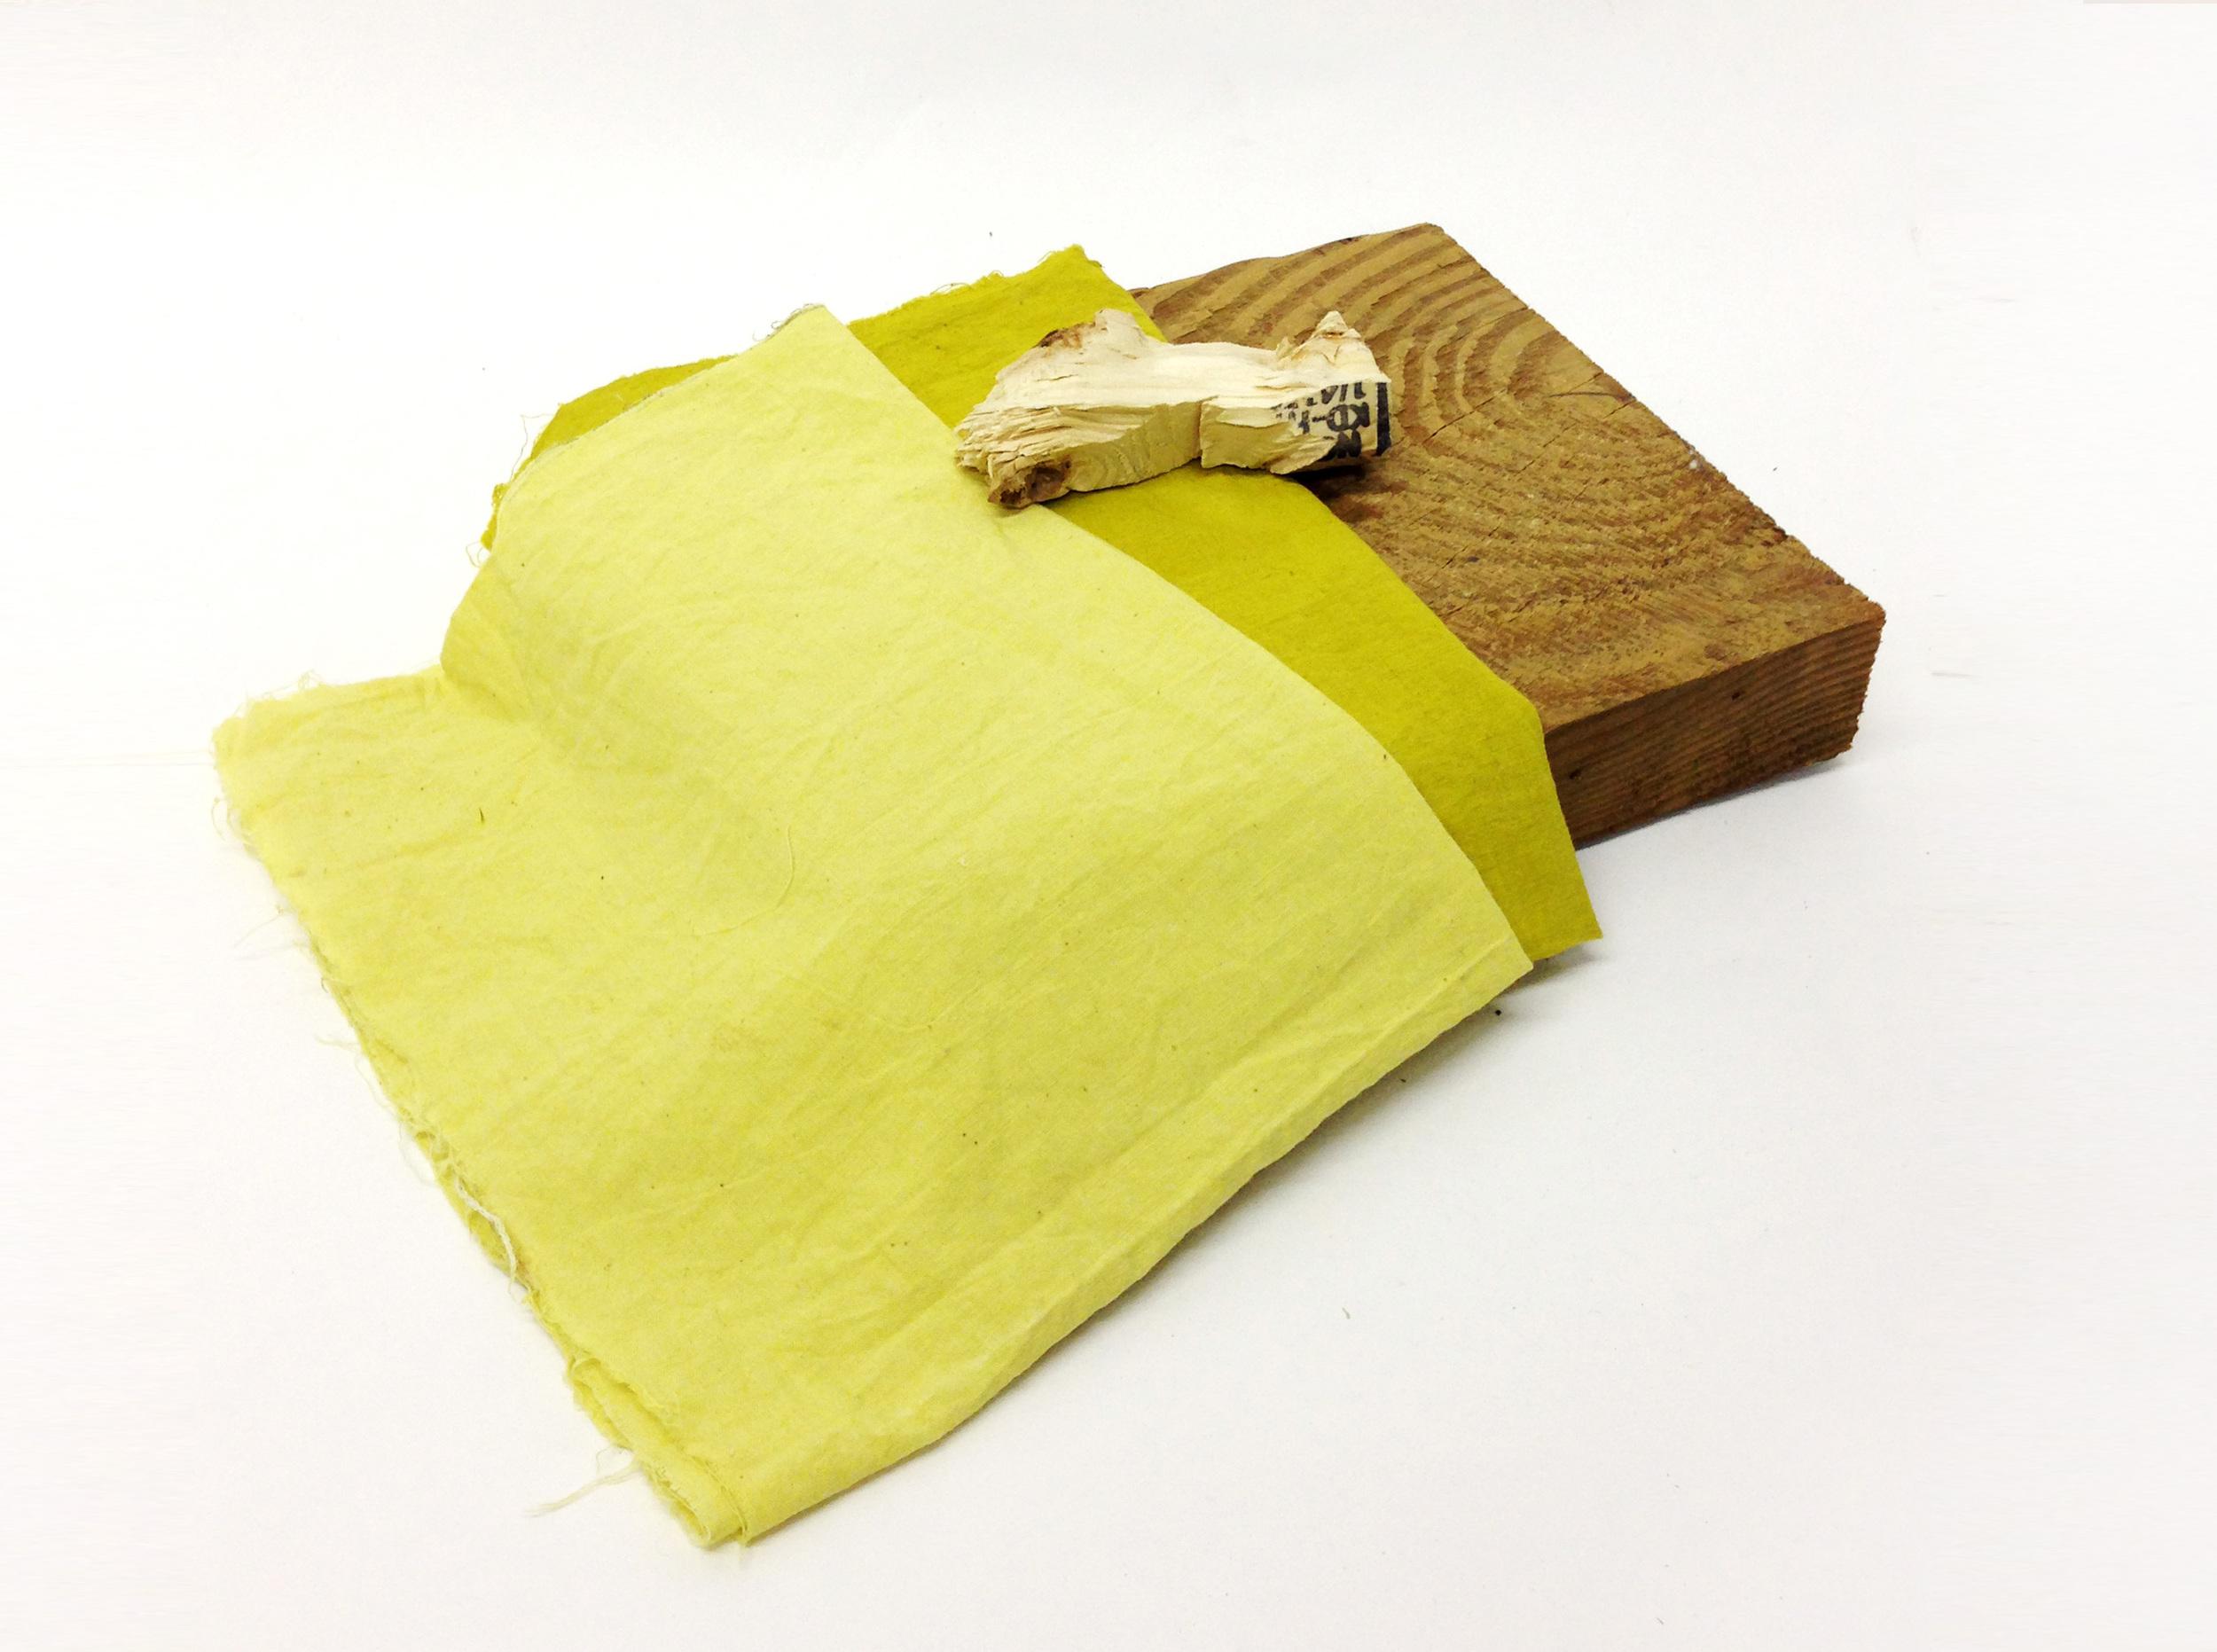 "FLORA   marigold dyed cotton, pine 18"" x 16"" x 3.5"" 2014"